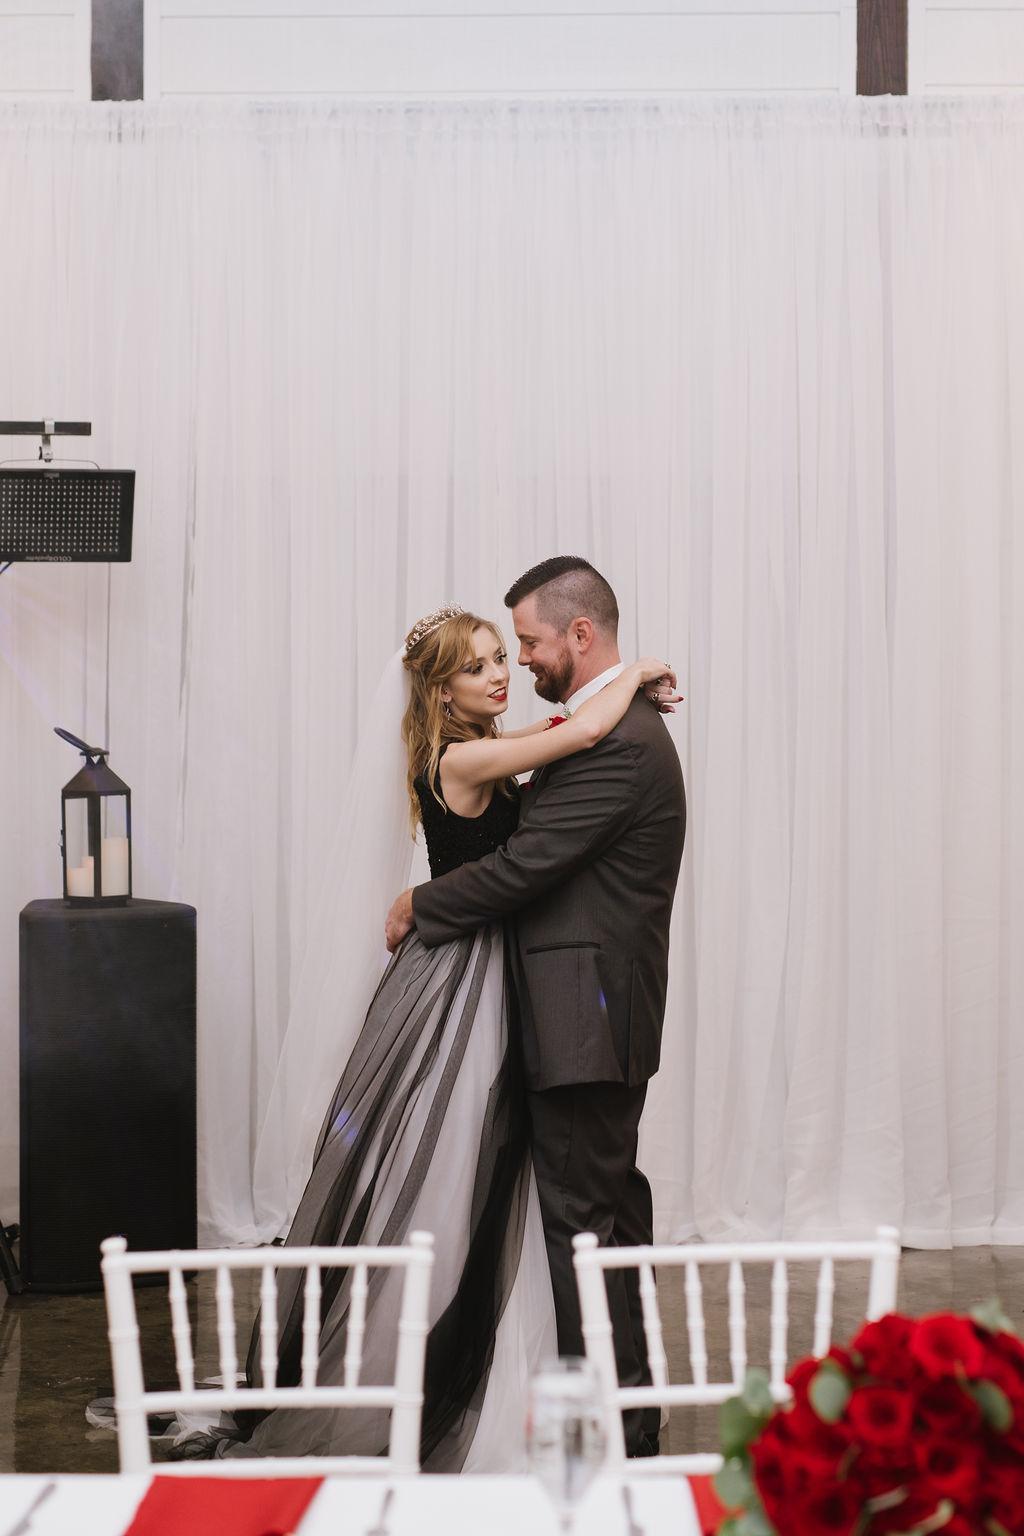 Dream Point Ranch Tulsa White Barn Wedding Venue 40.jpg